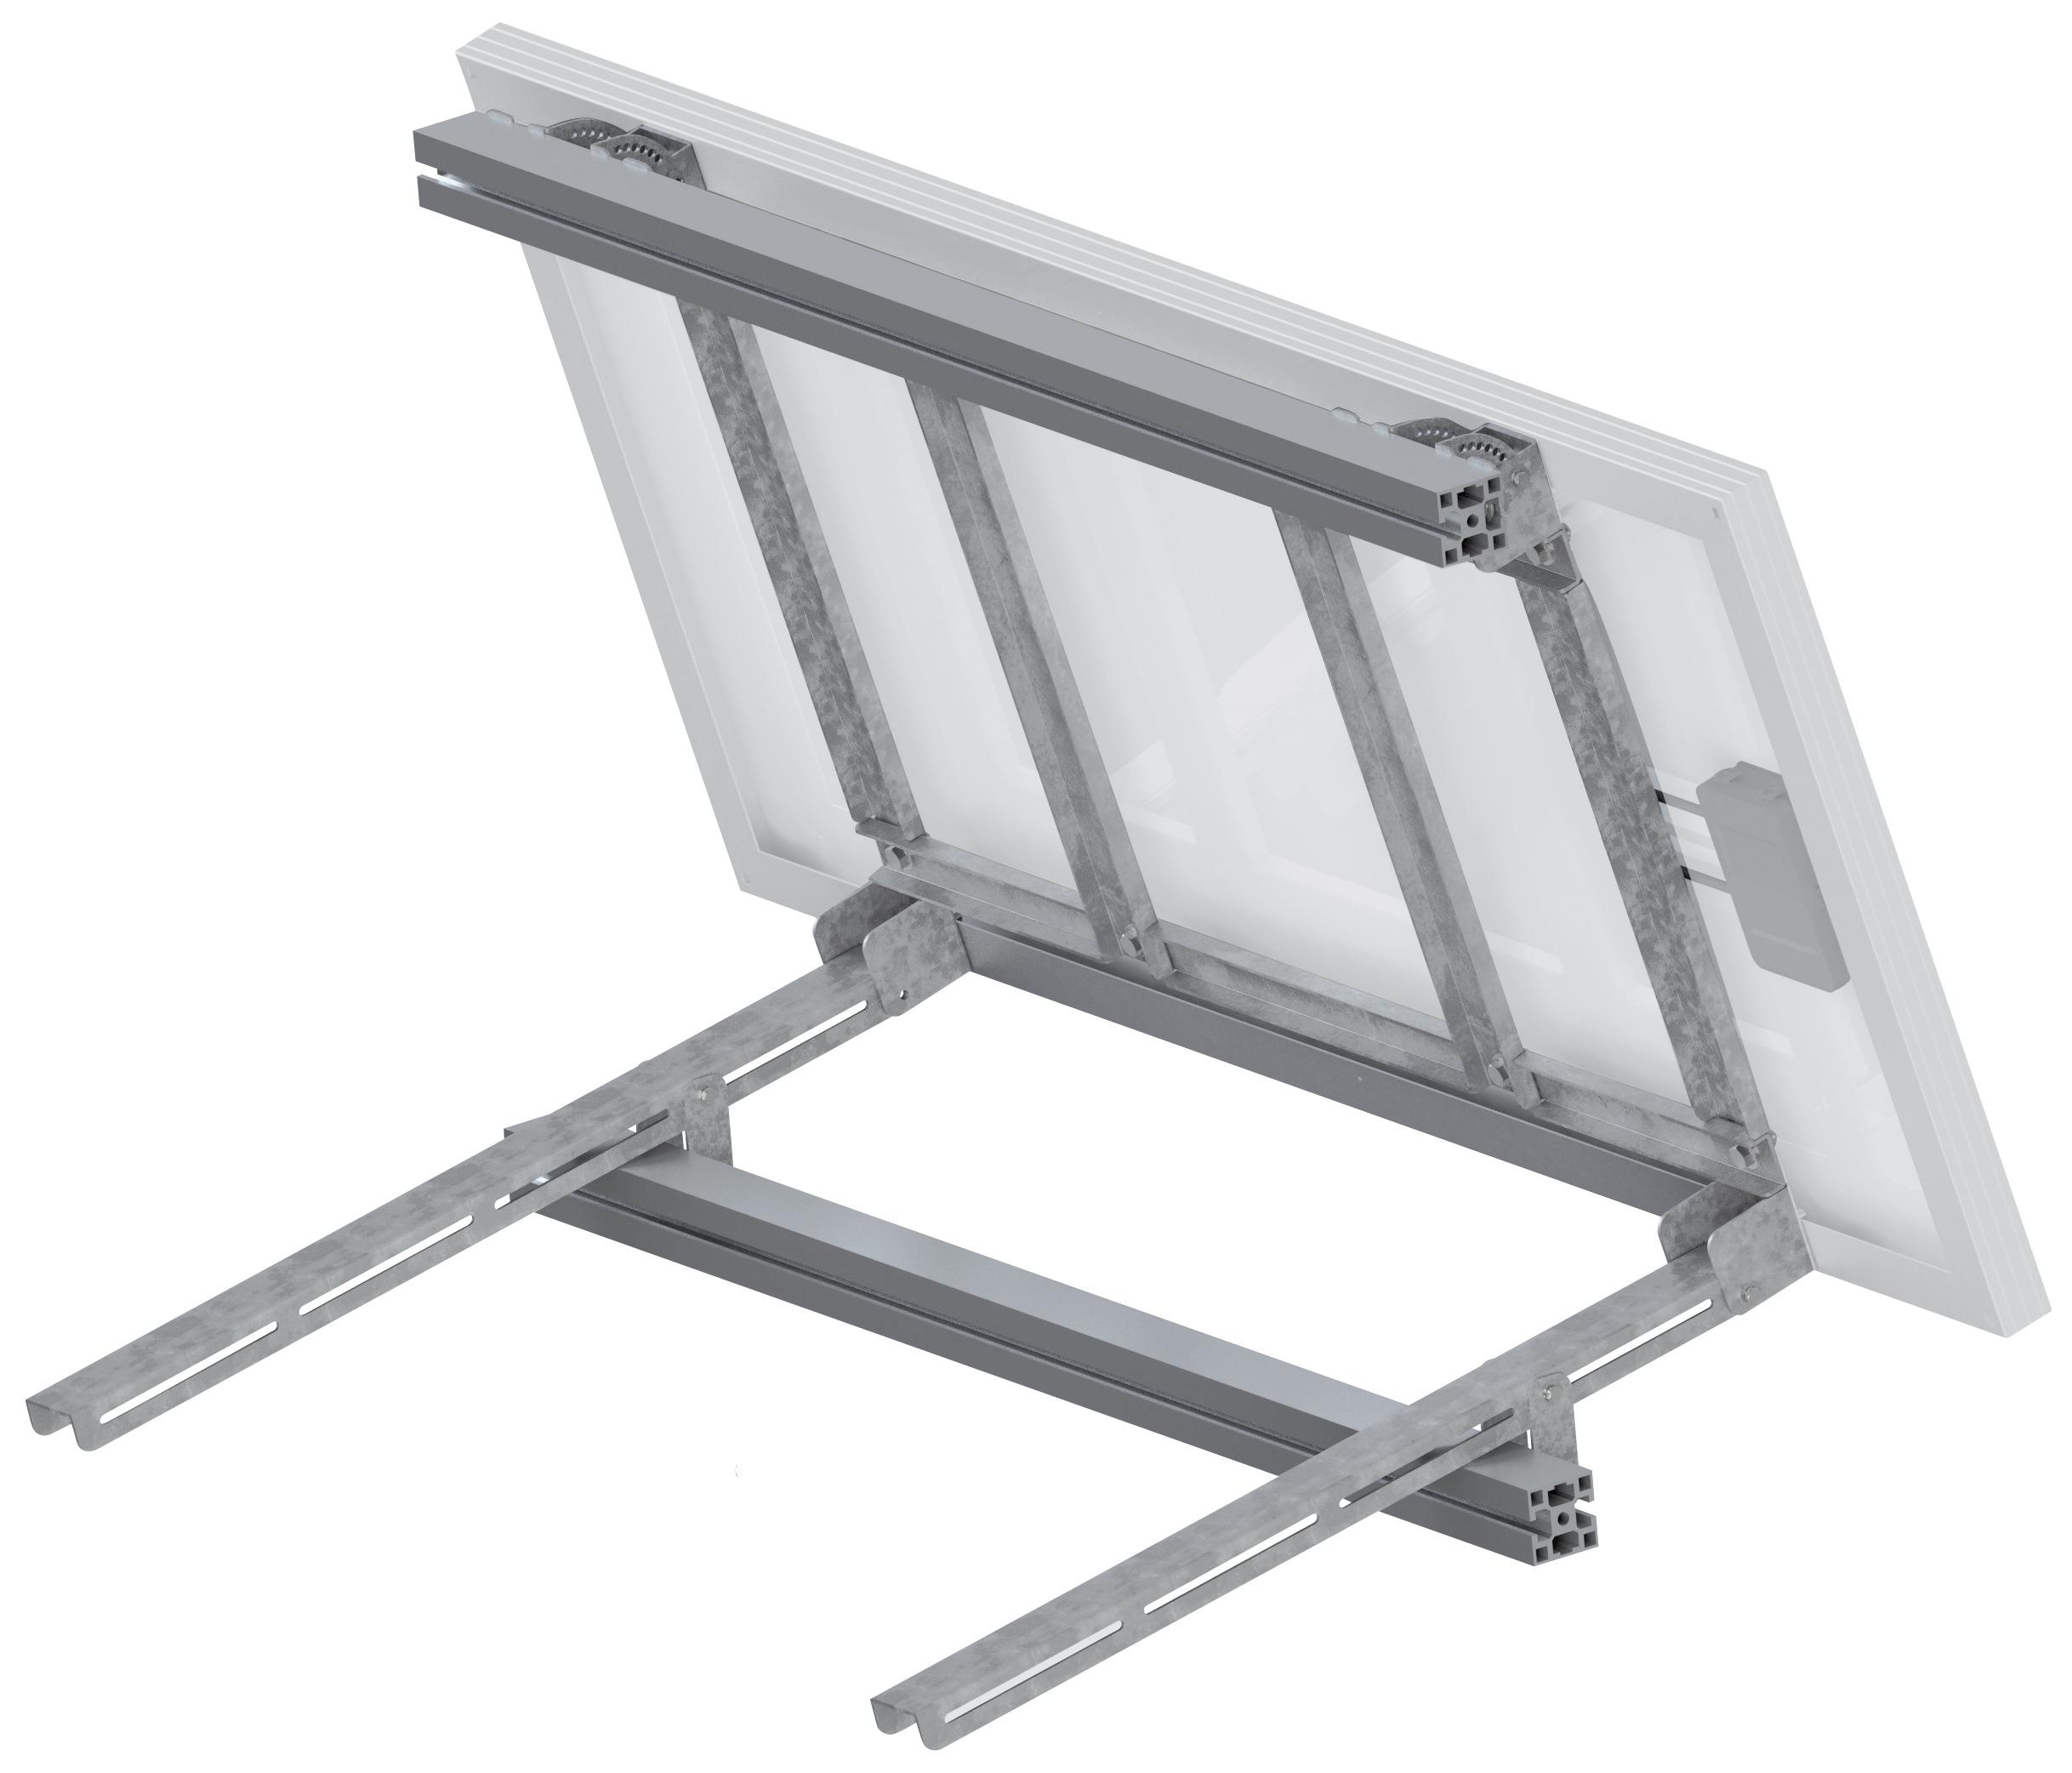 accessoires pour installations solaires. Black Bedroom Furniture Sets. Home Design Ideas